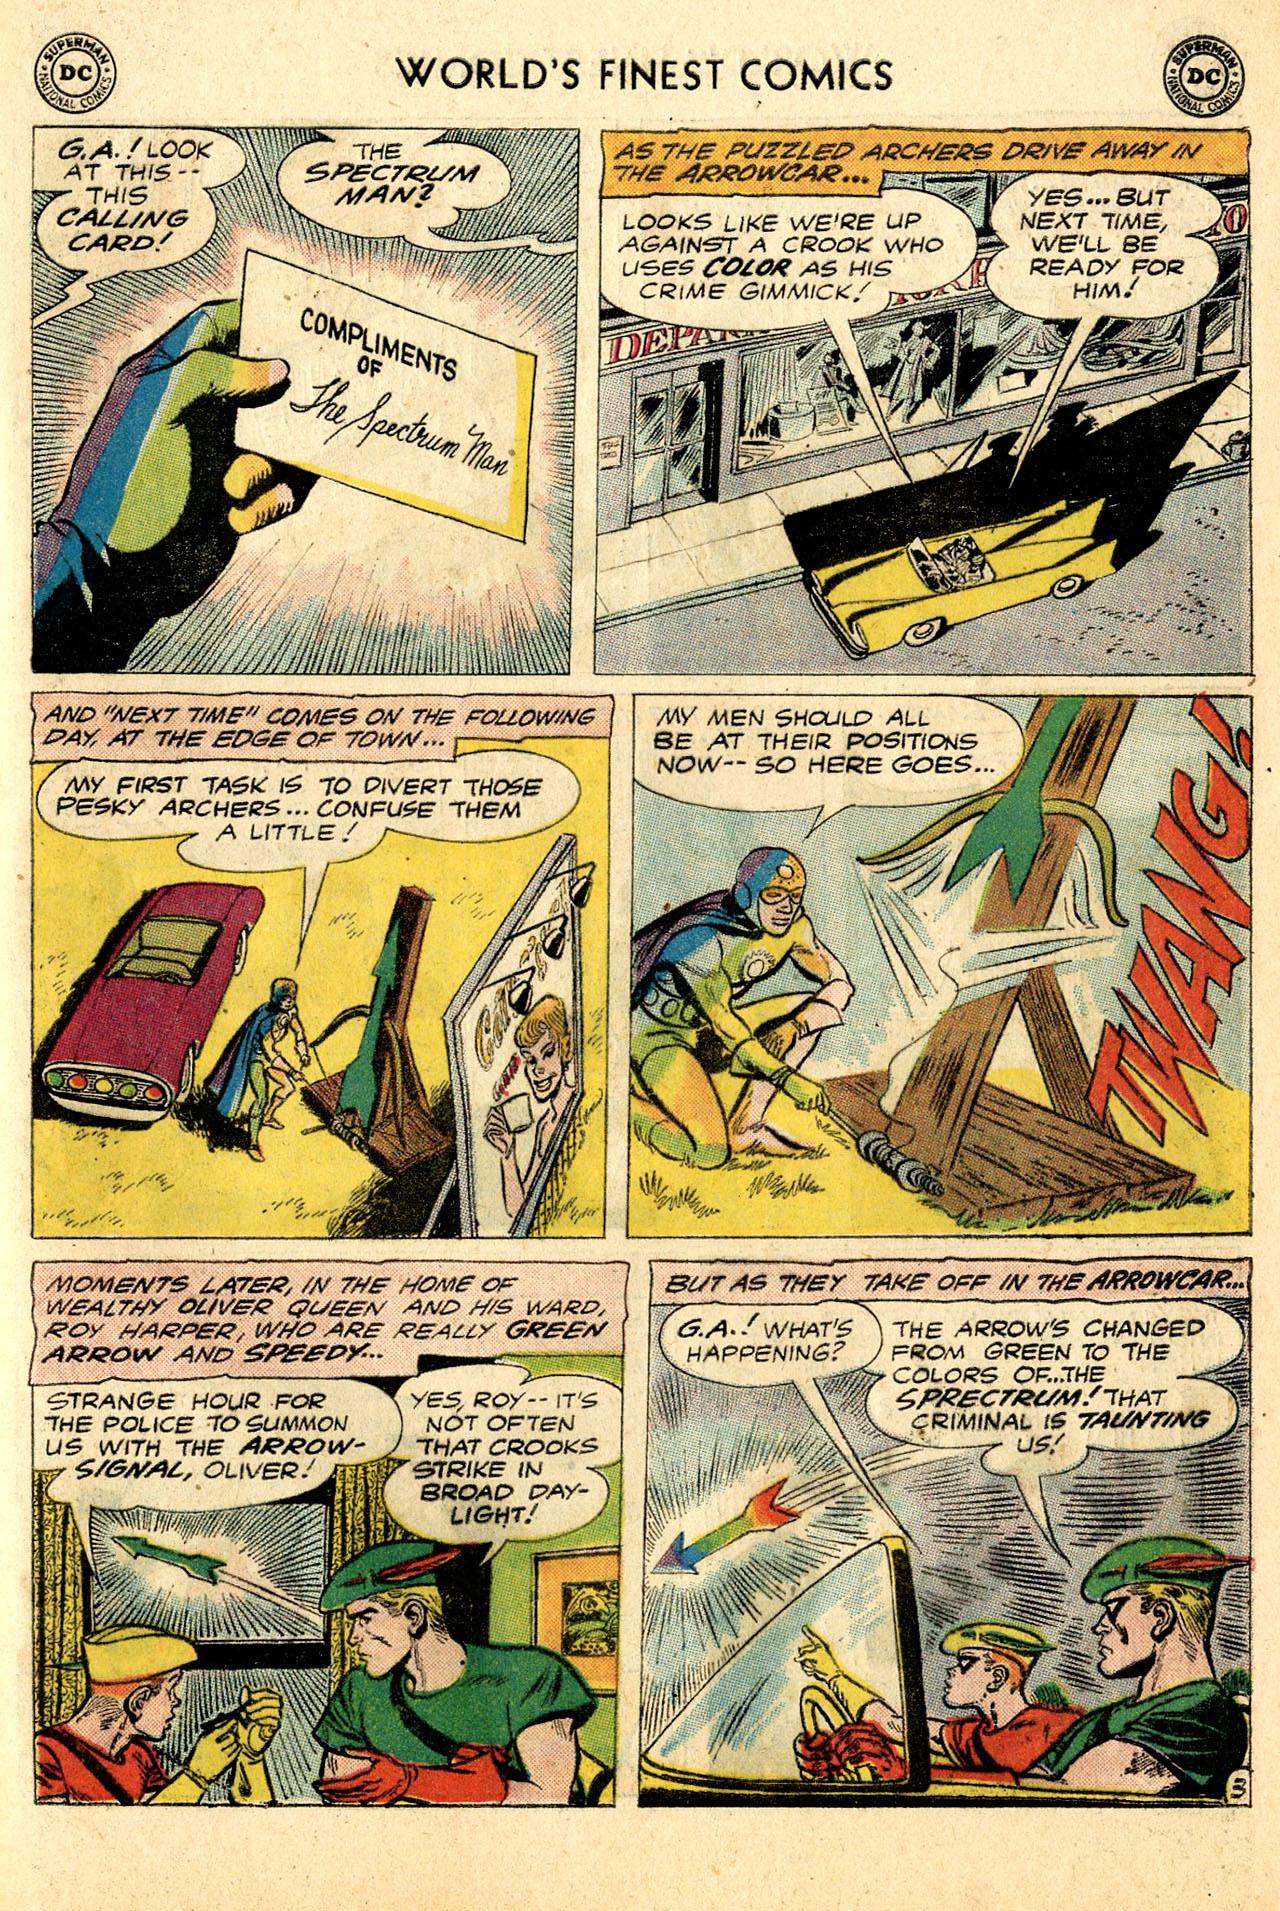 Read online World's Finest Comics comic -  Issue #110 - 29